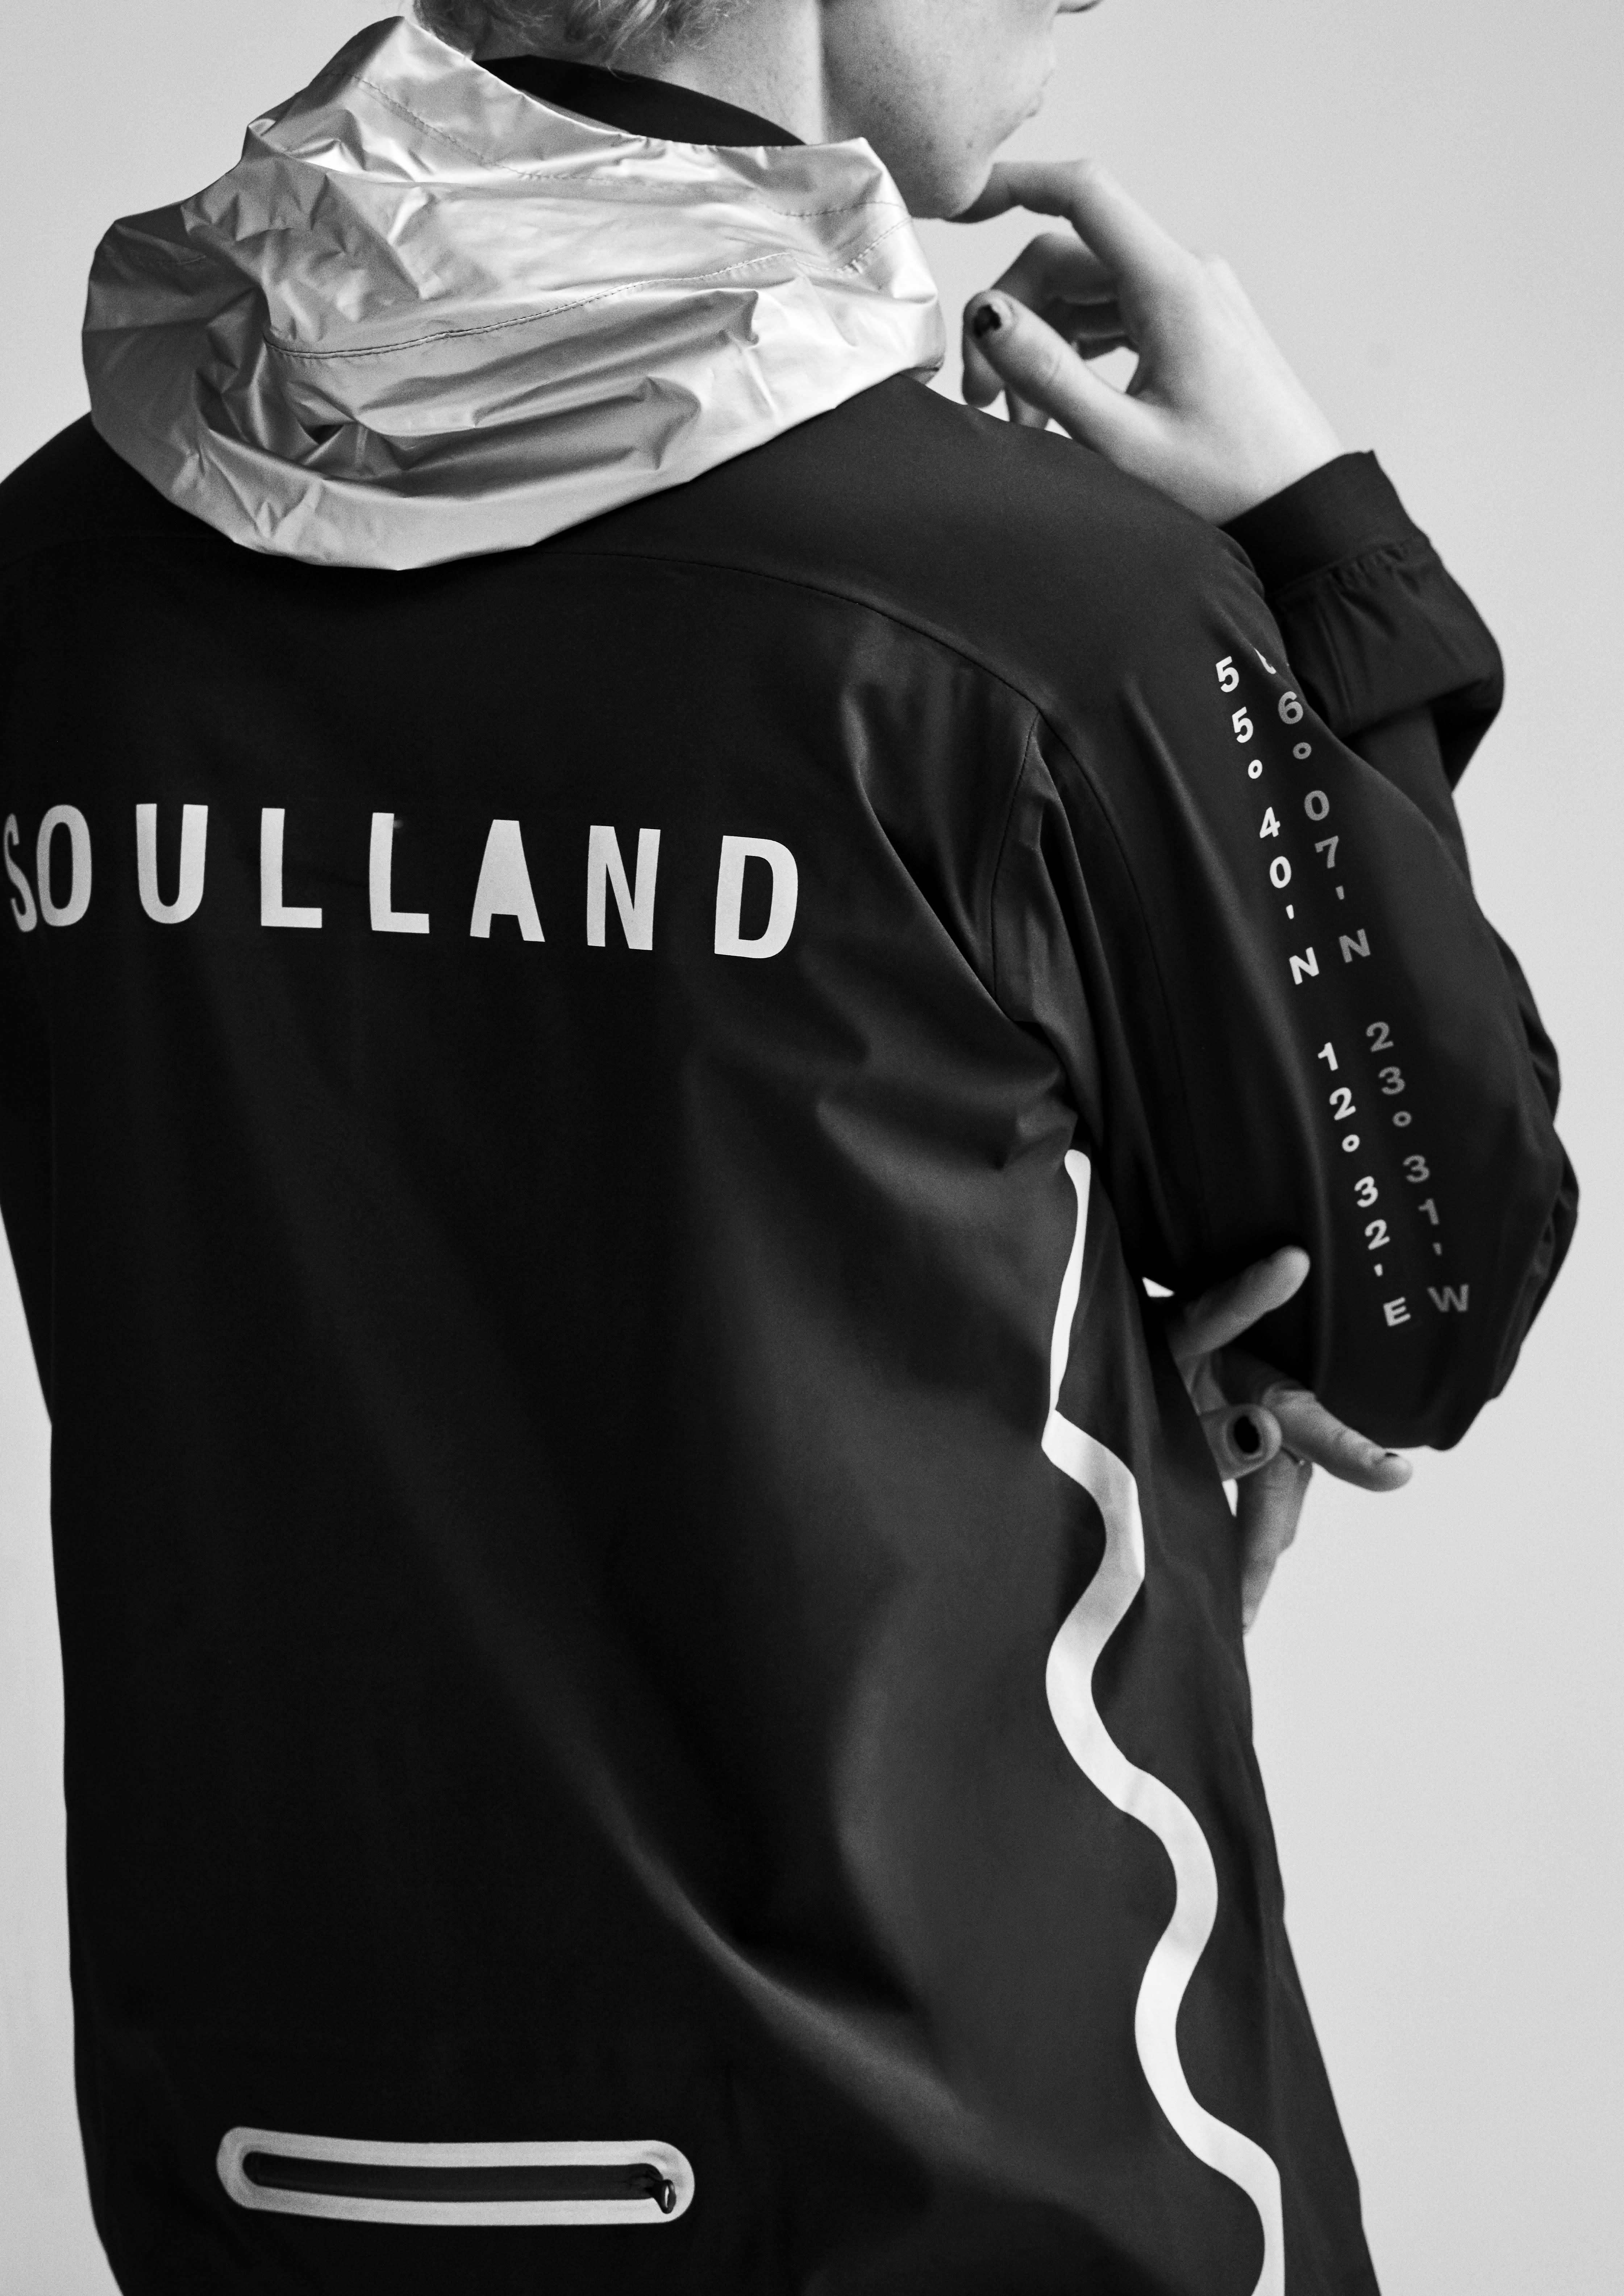 soulland-66north-3